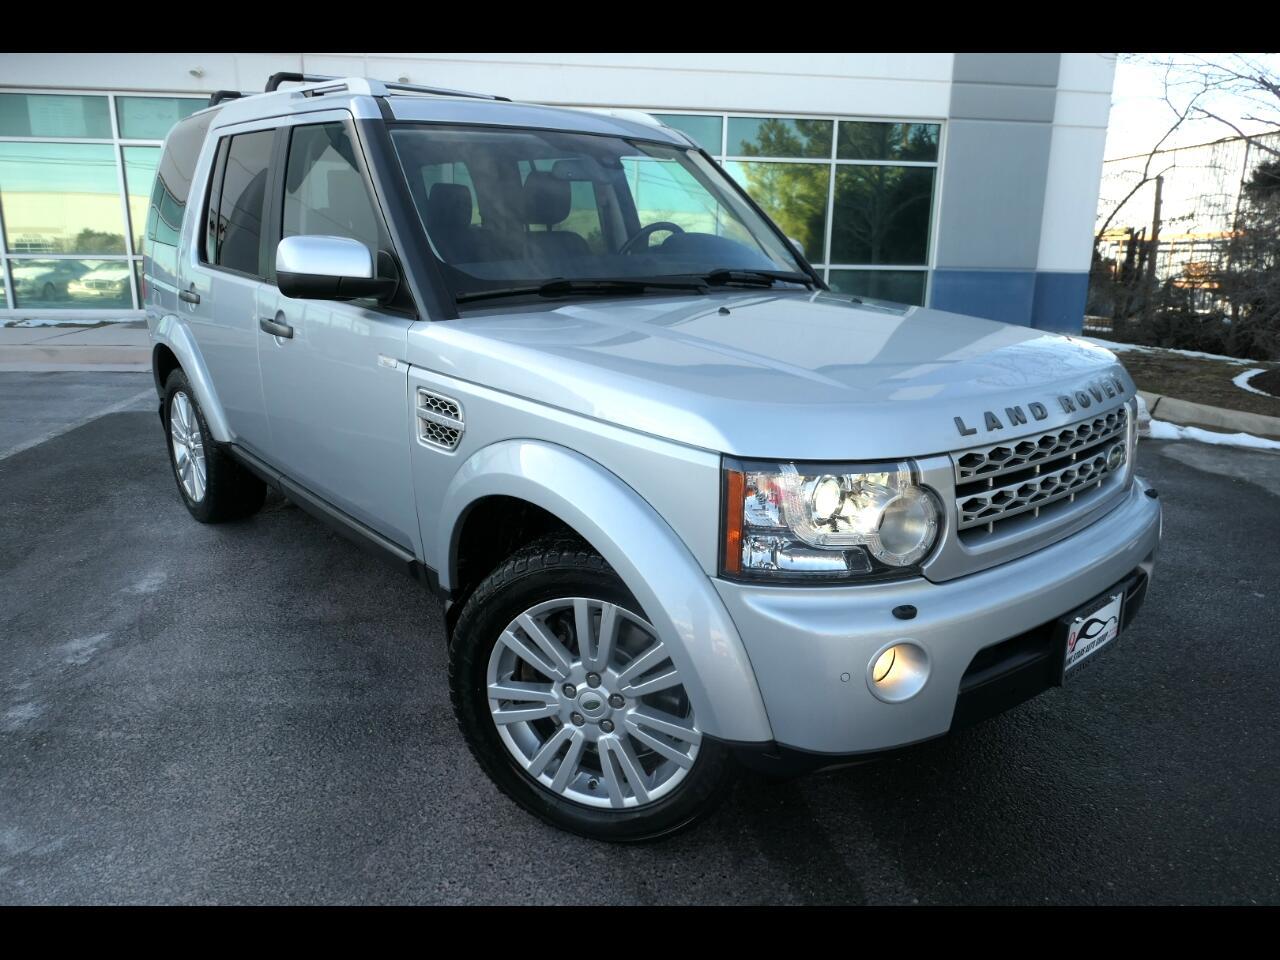 2010 Land Rover LR4 HSE Luxury